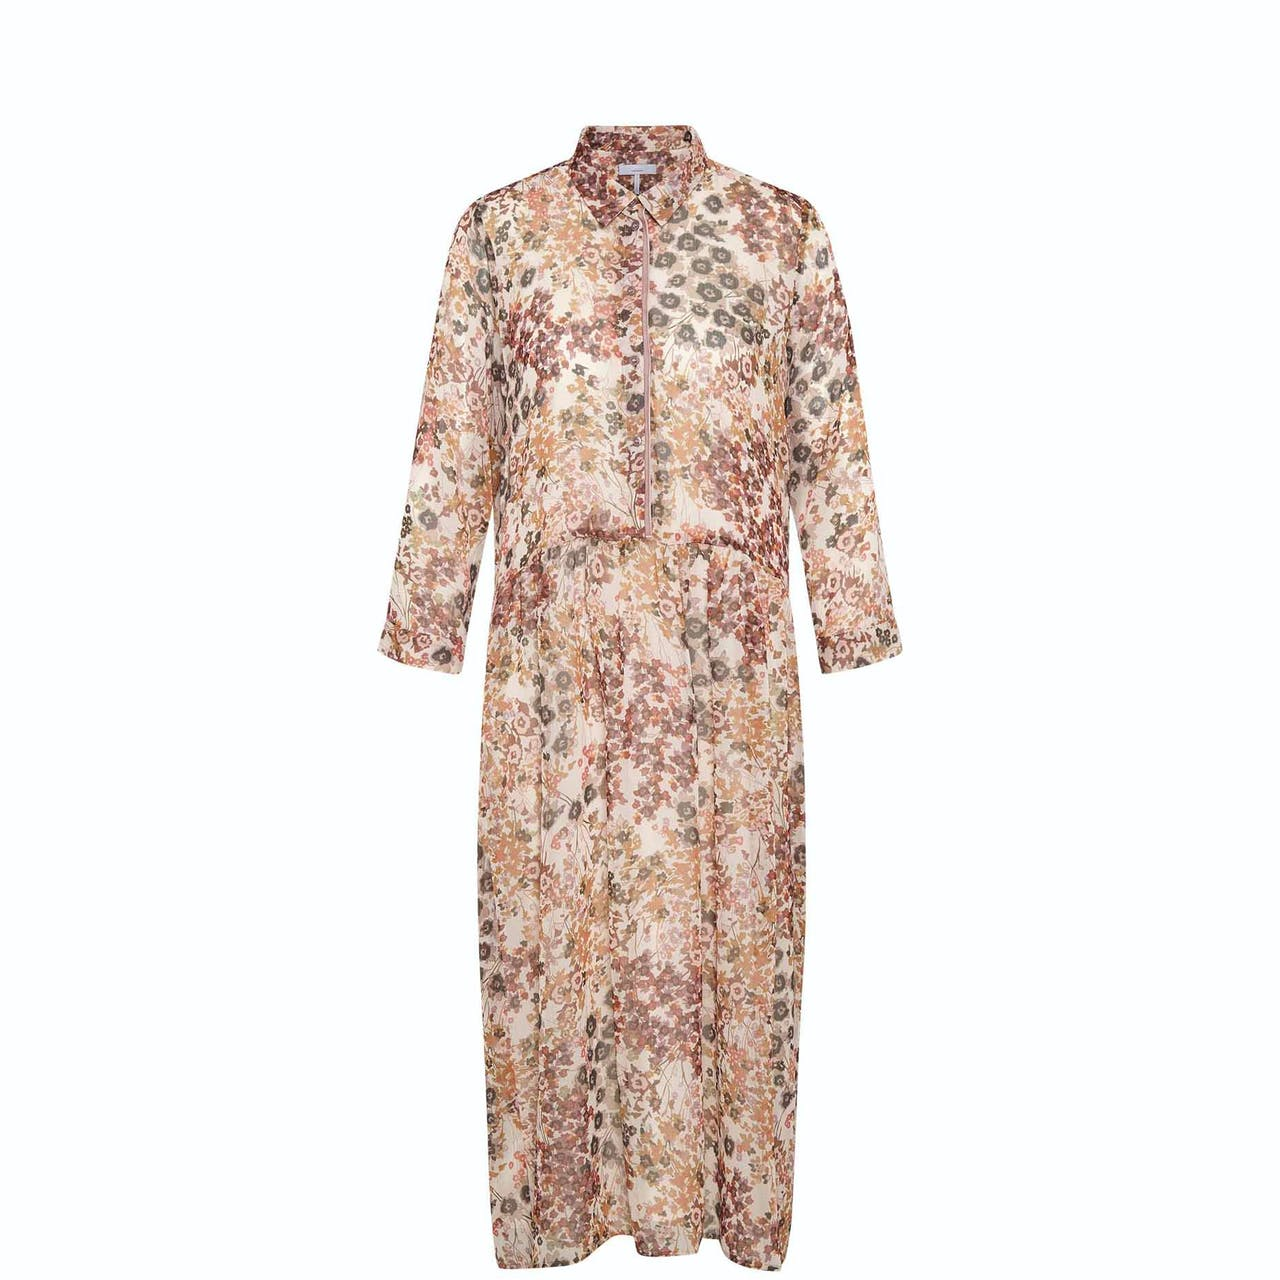 Kleid - CIDAVIS - Muster